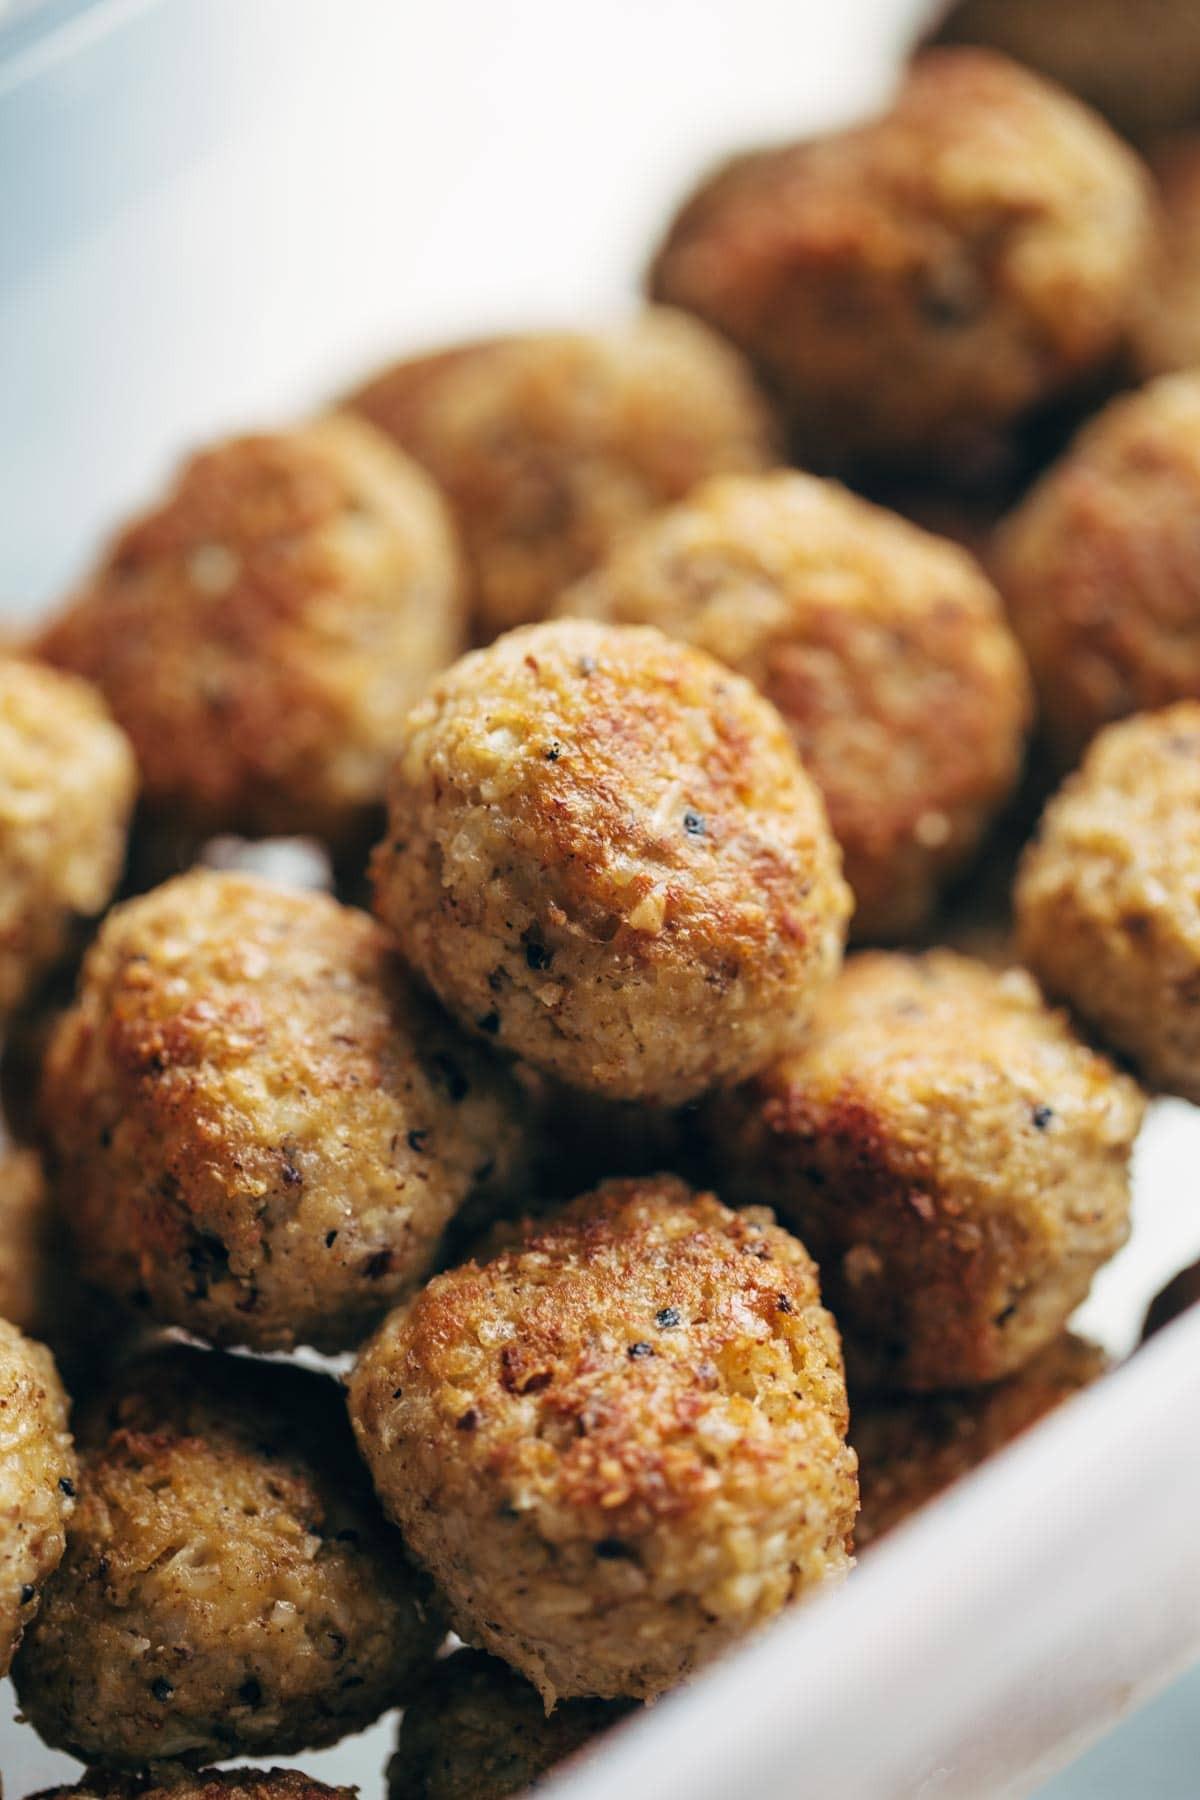 Vegetarian Meatball Recipes  30 Minute Ve arian Meatballs Recipe Pinch of Yum